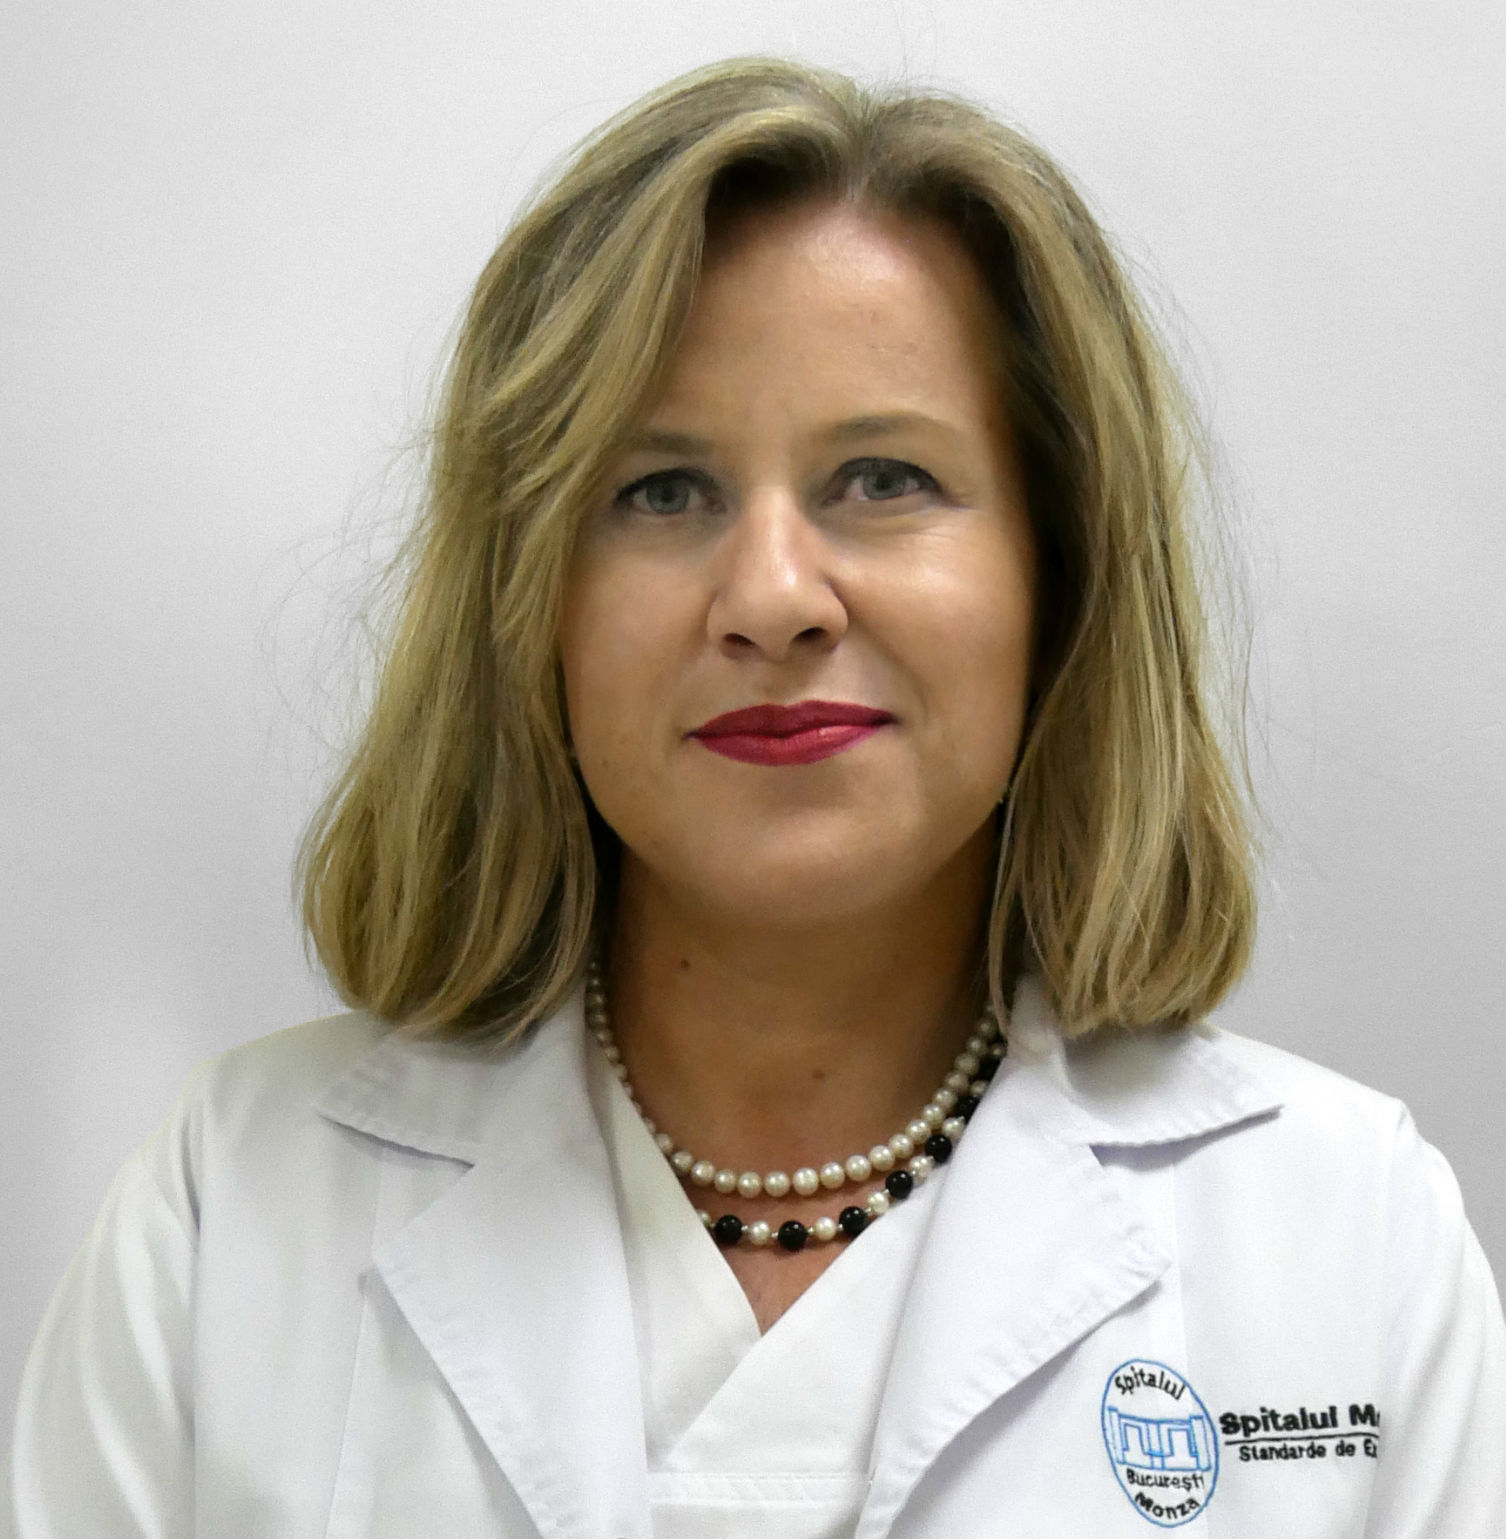 Dr. Raluca Oprea